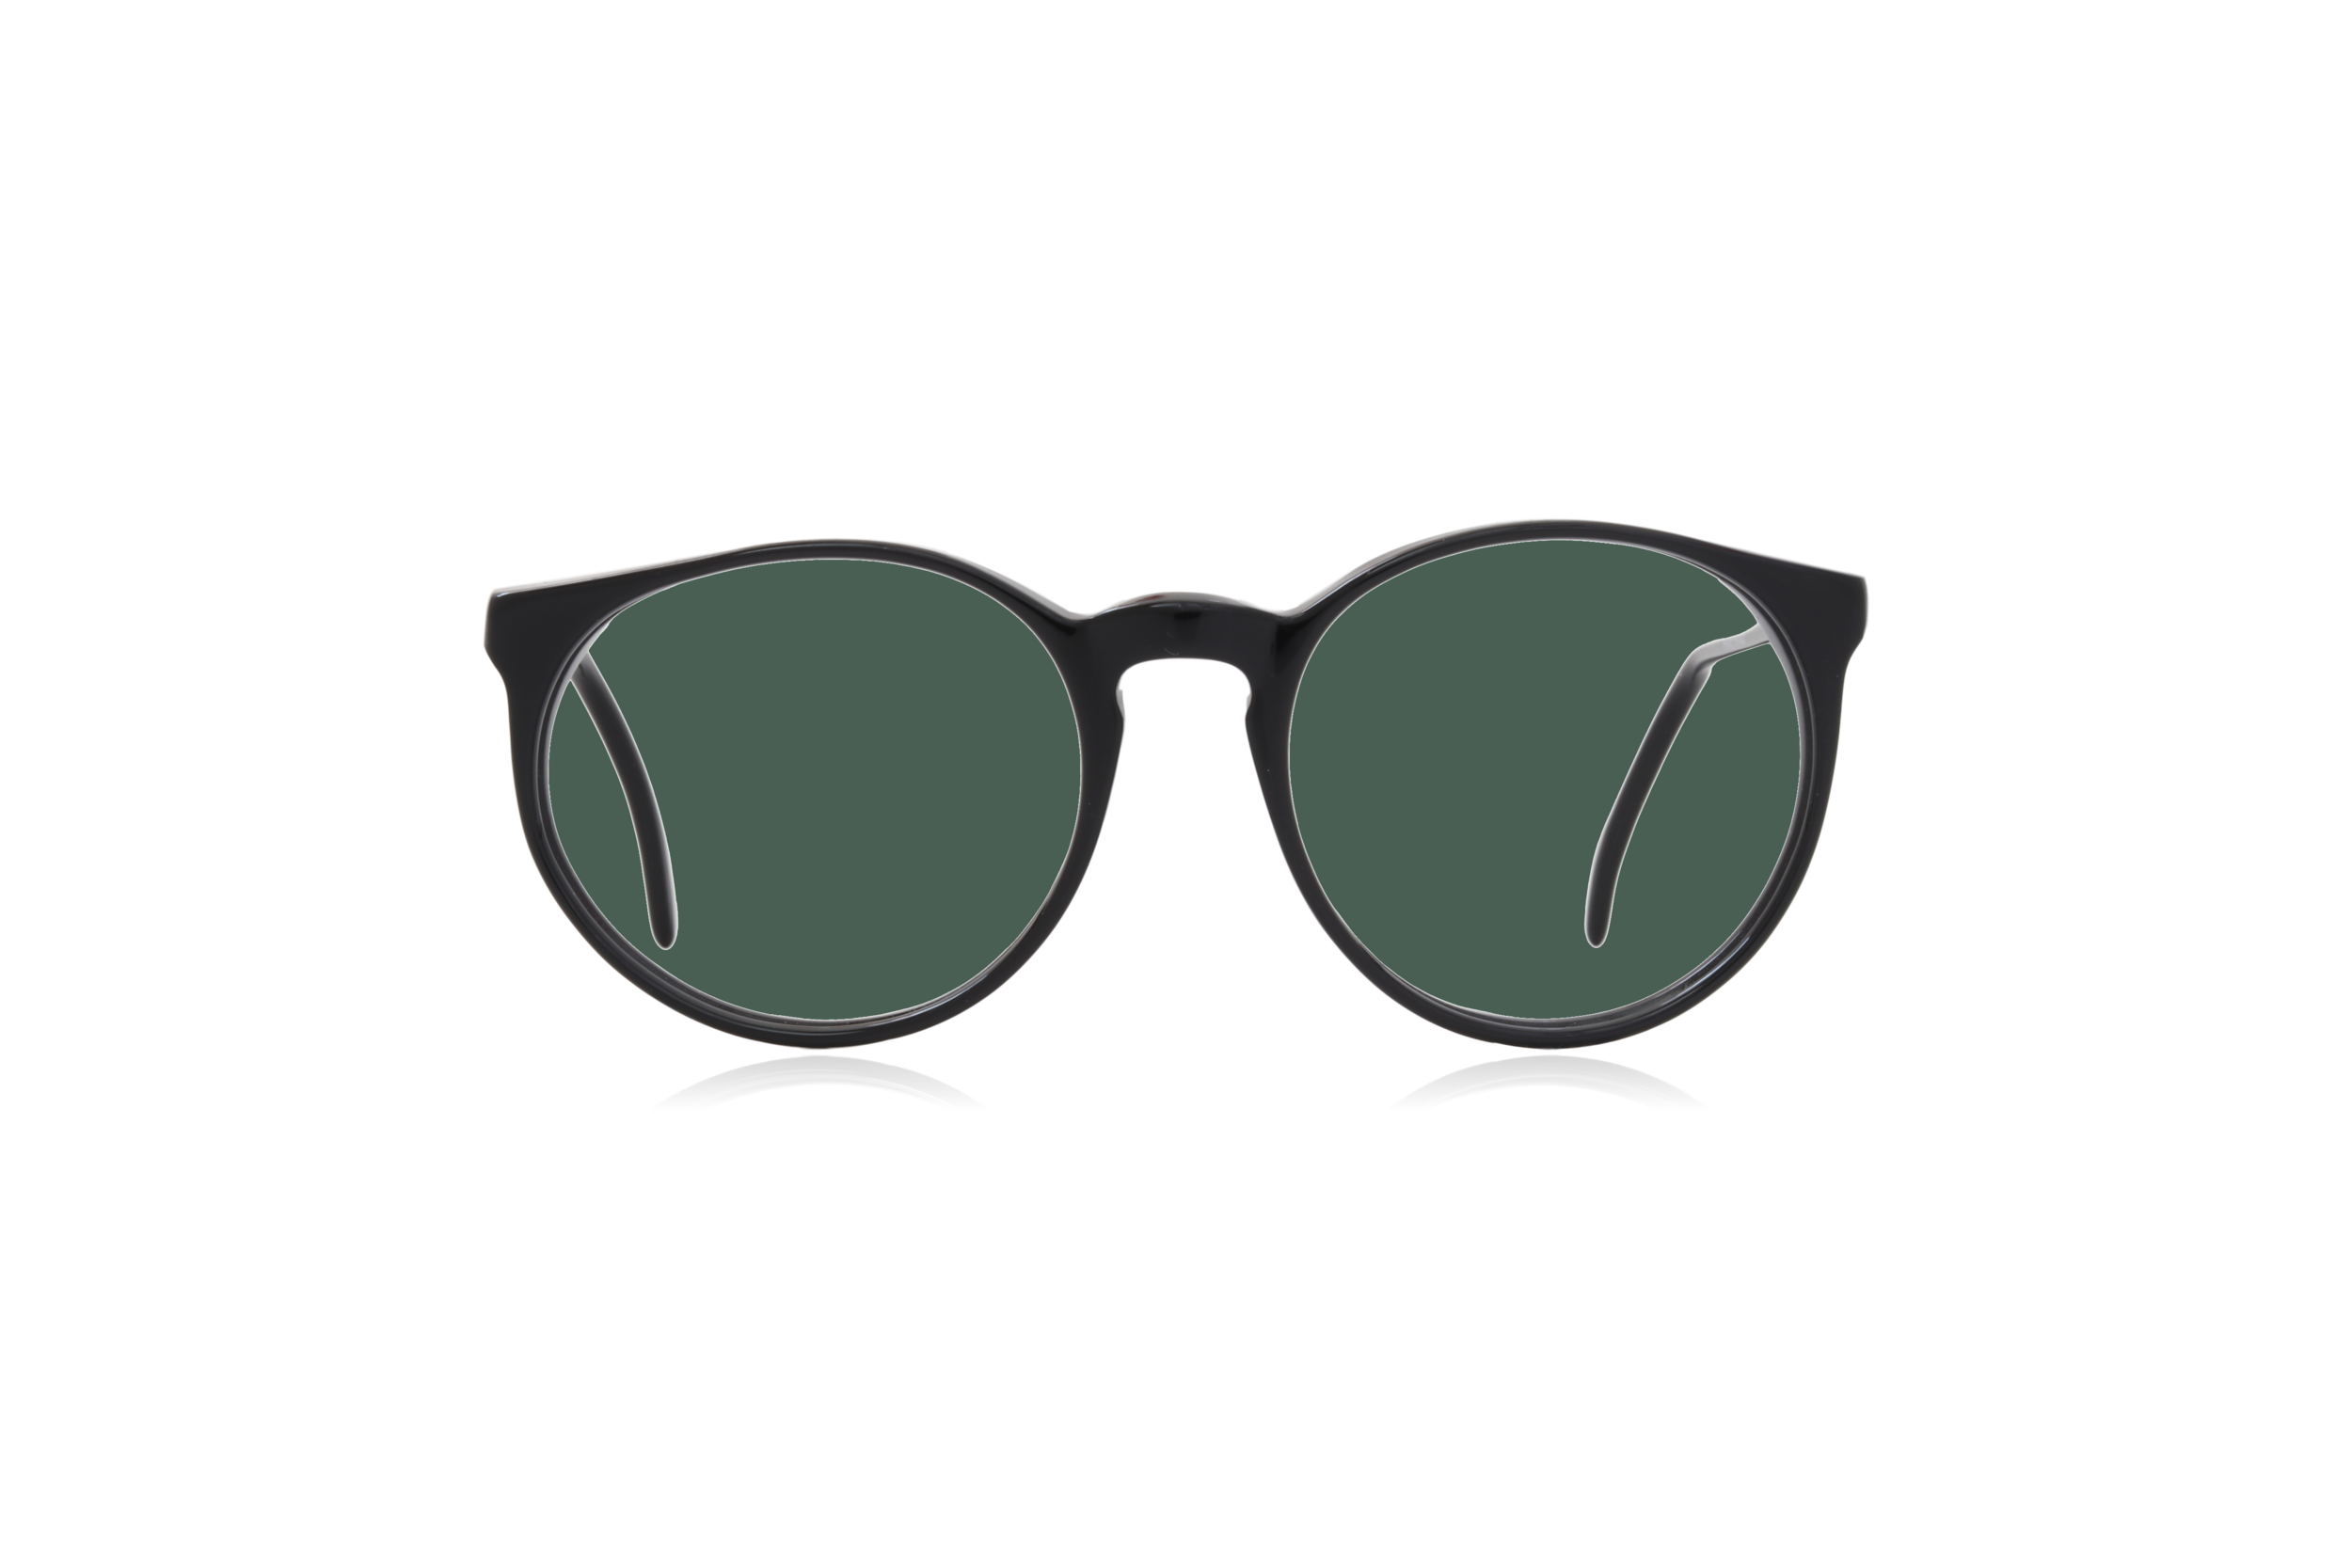 Peep Eyewear, Vintage Glasses, 1980s, Morel 2730, 1980s, Green Lenses.png